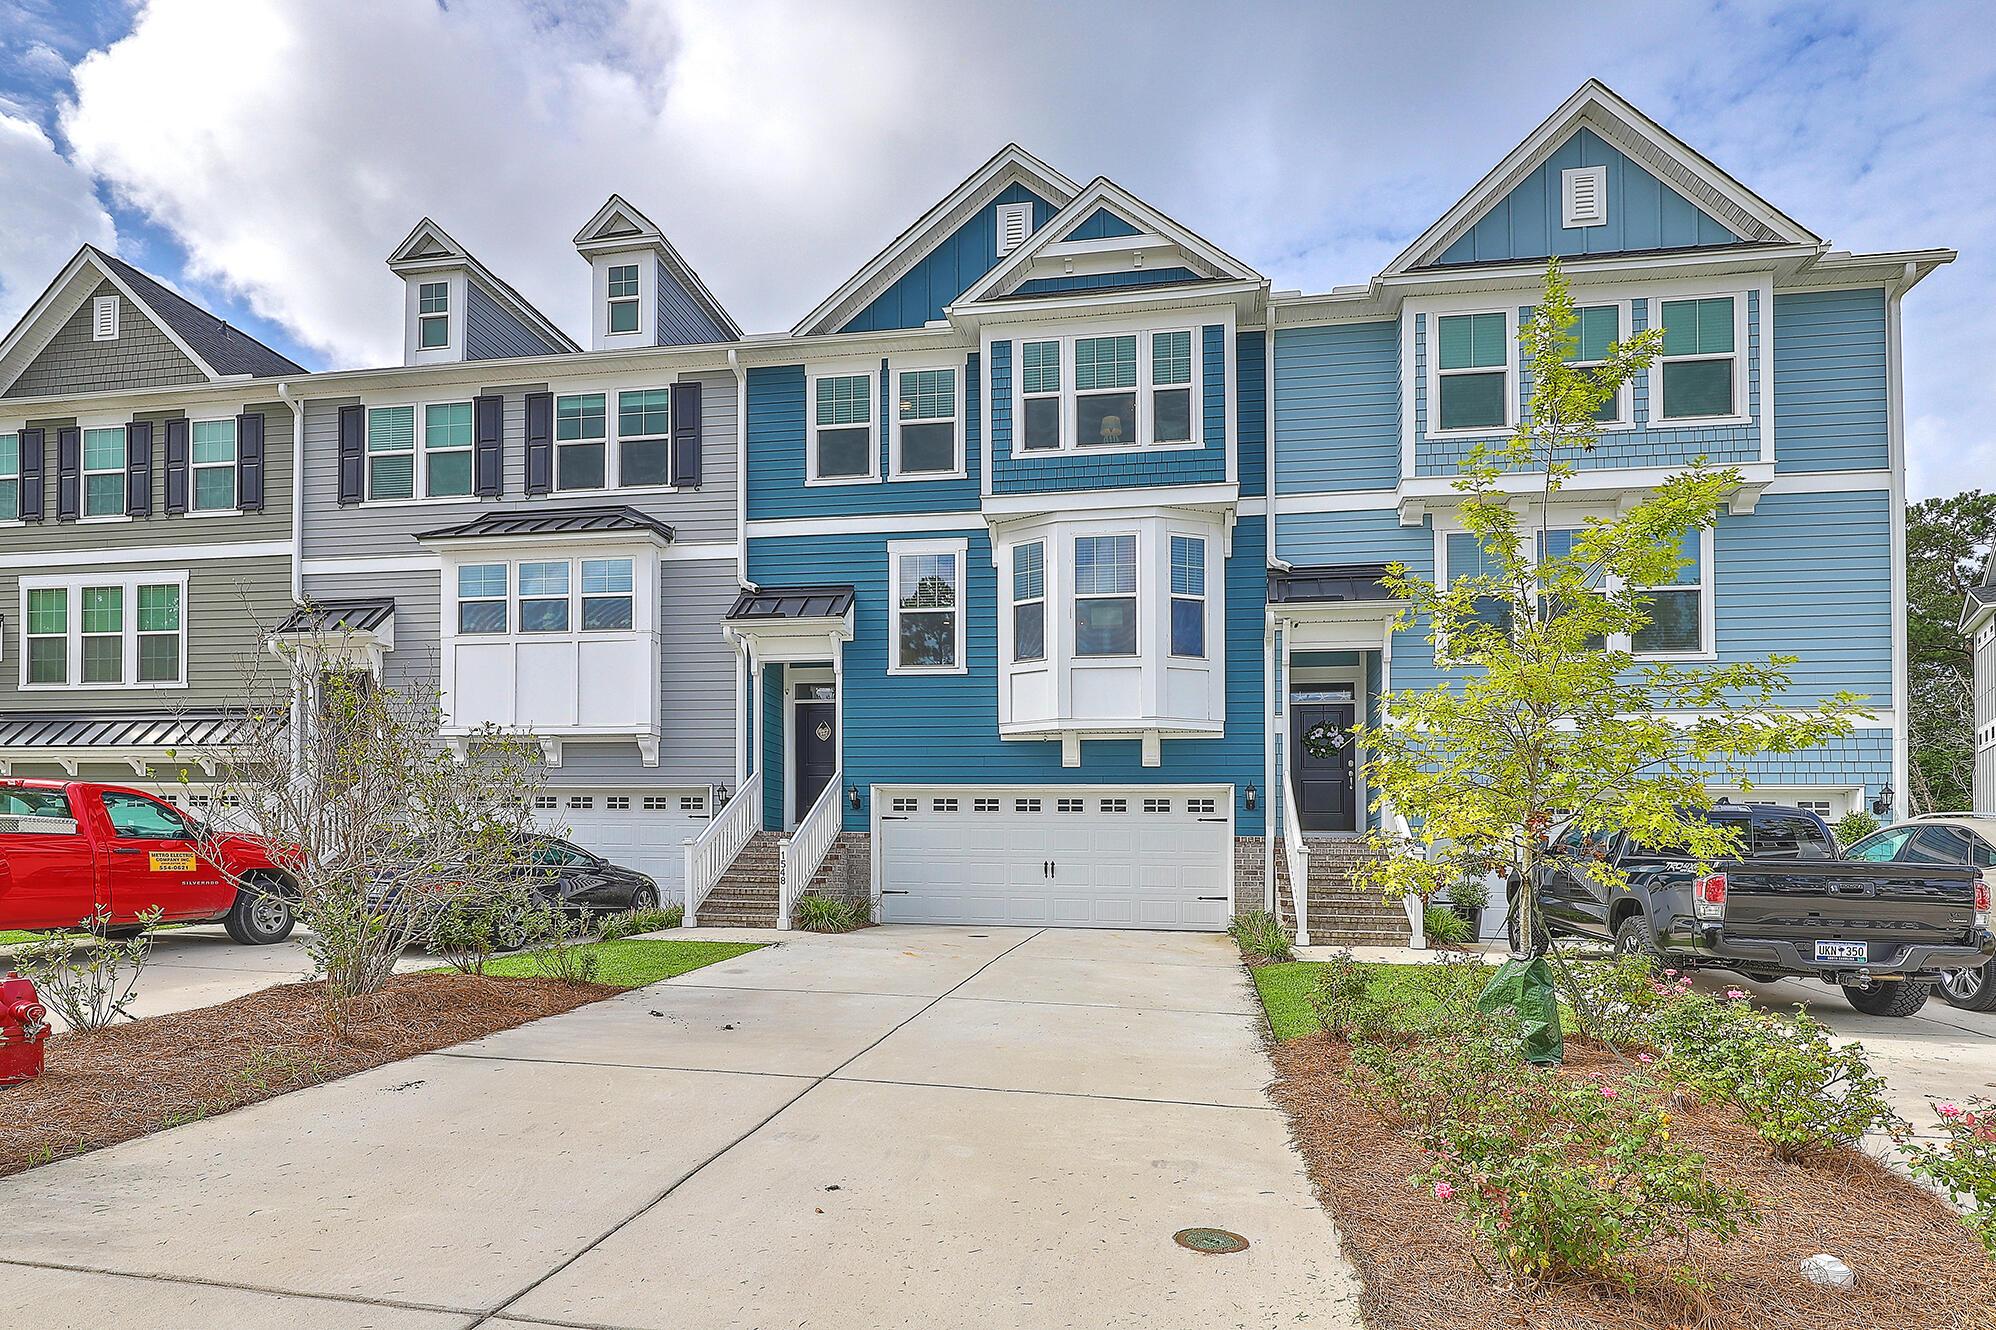 Park West Homes For Sale - 1548 Moss Spring, Mount Pleasant, SC - 5